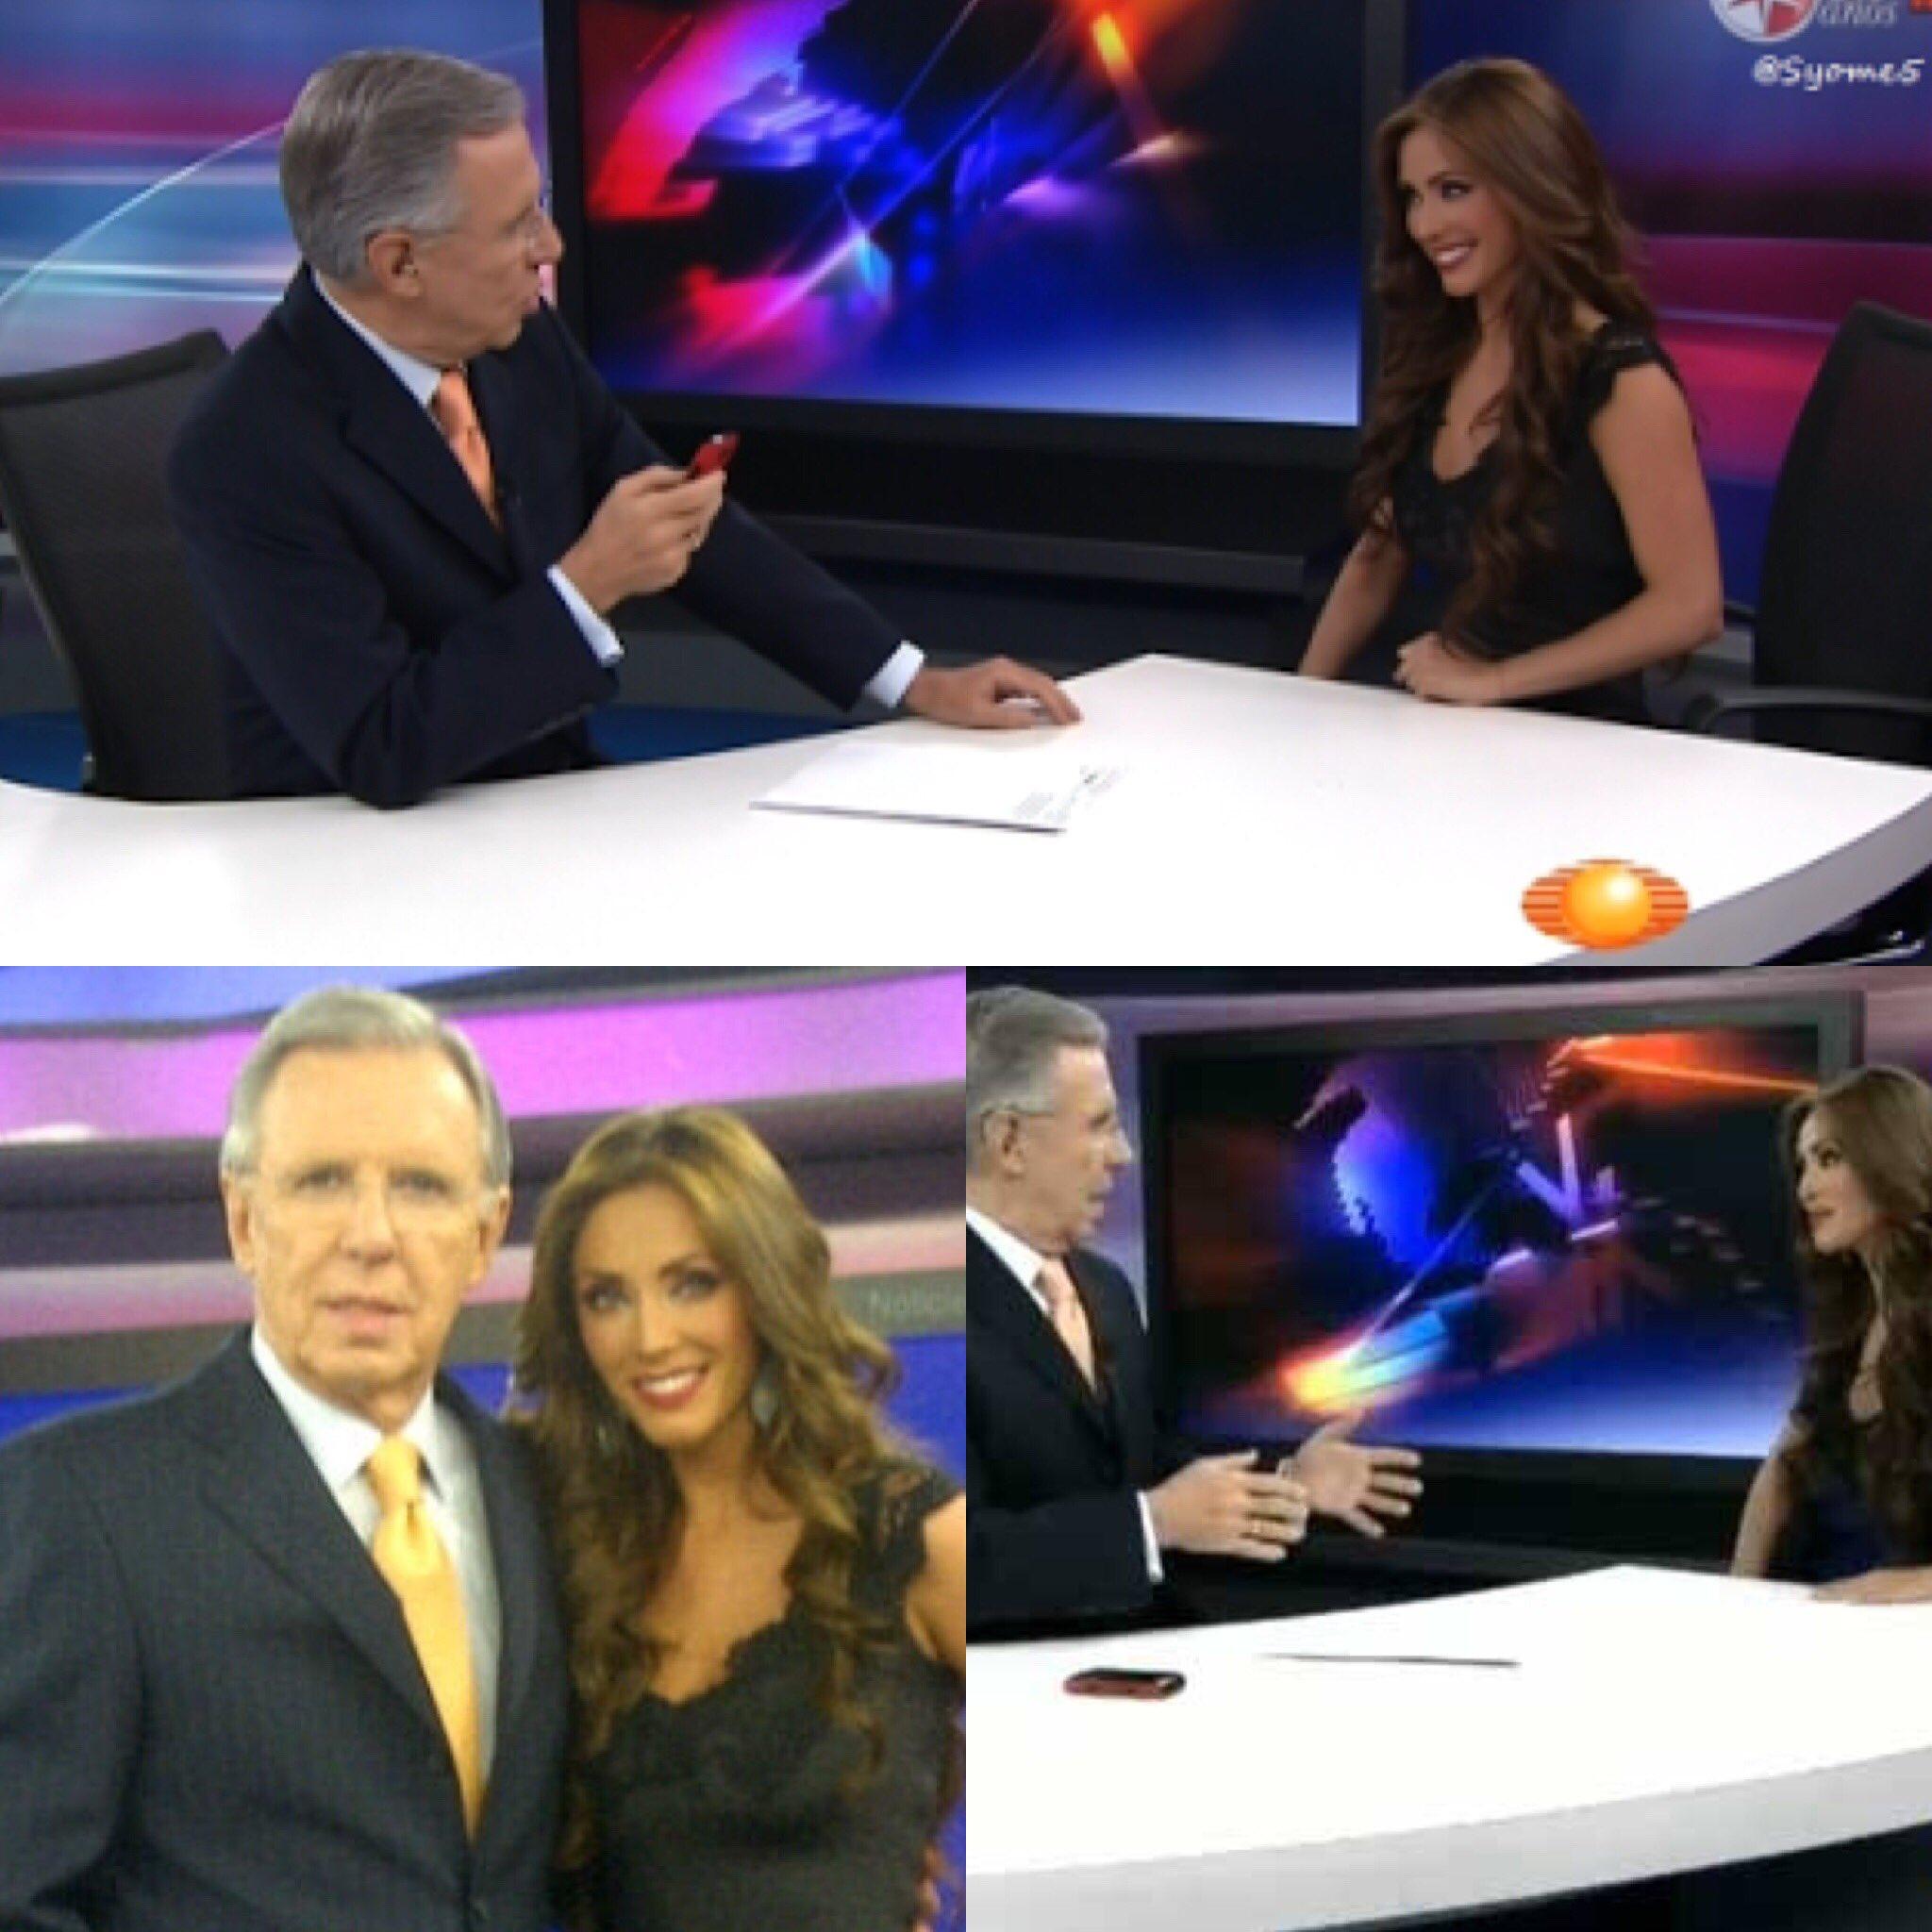 La entrevista q nunca olvidaré ! #GraciasTeacher por todo lo sembrado en tantos corazones. @lopezdoriga #JuayNot ���� https://t.co/dw7UUetIlr